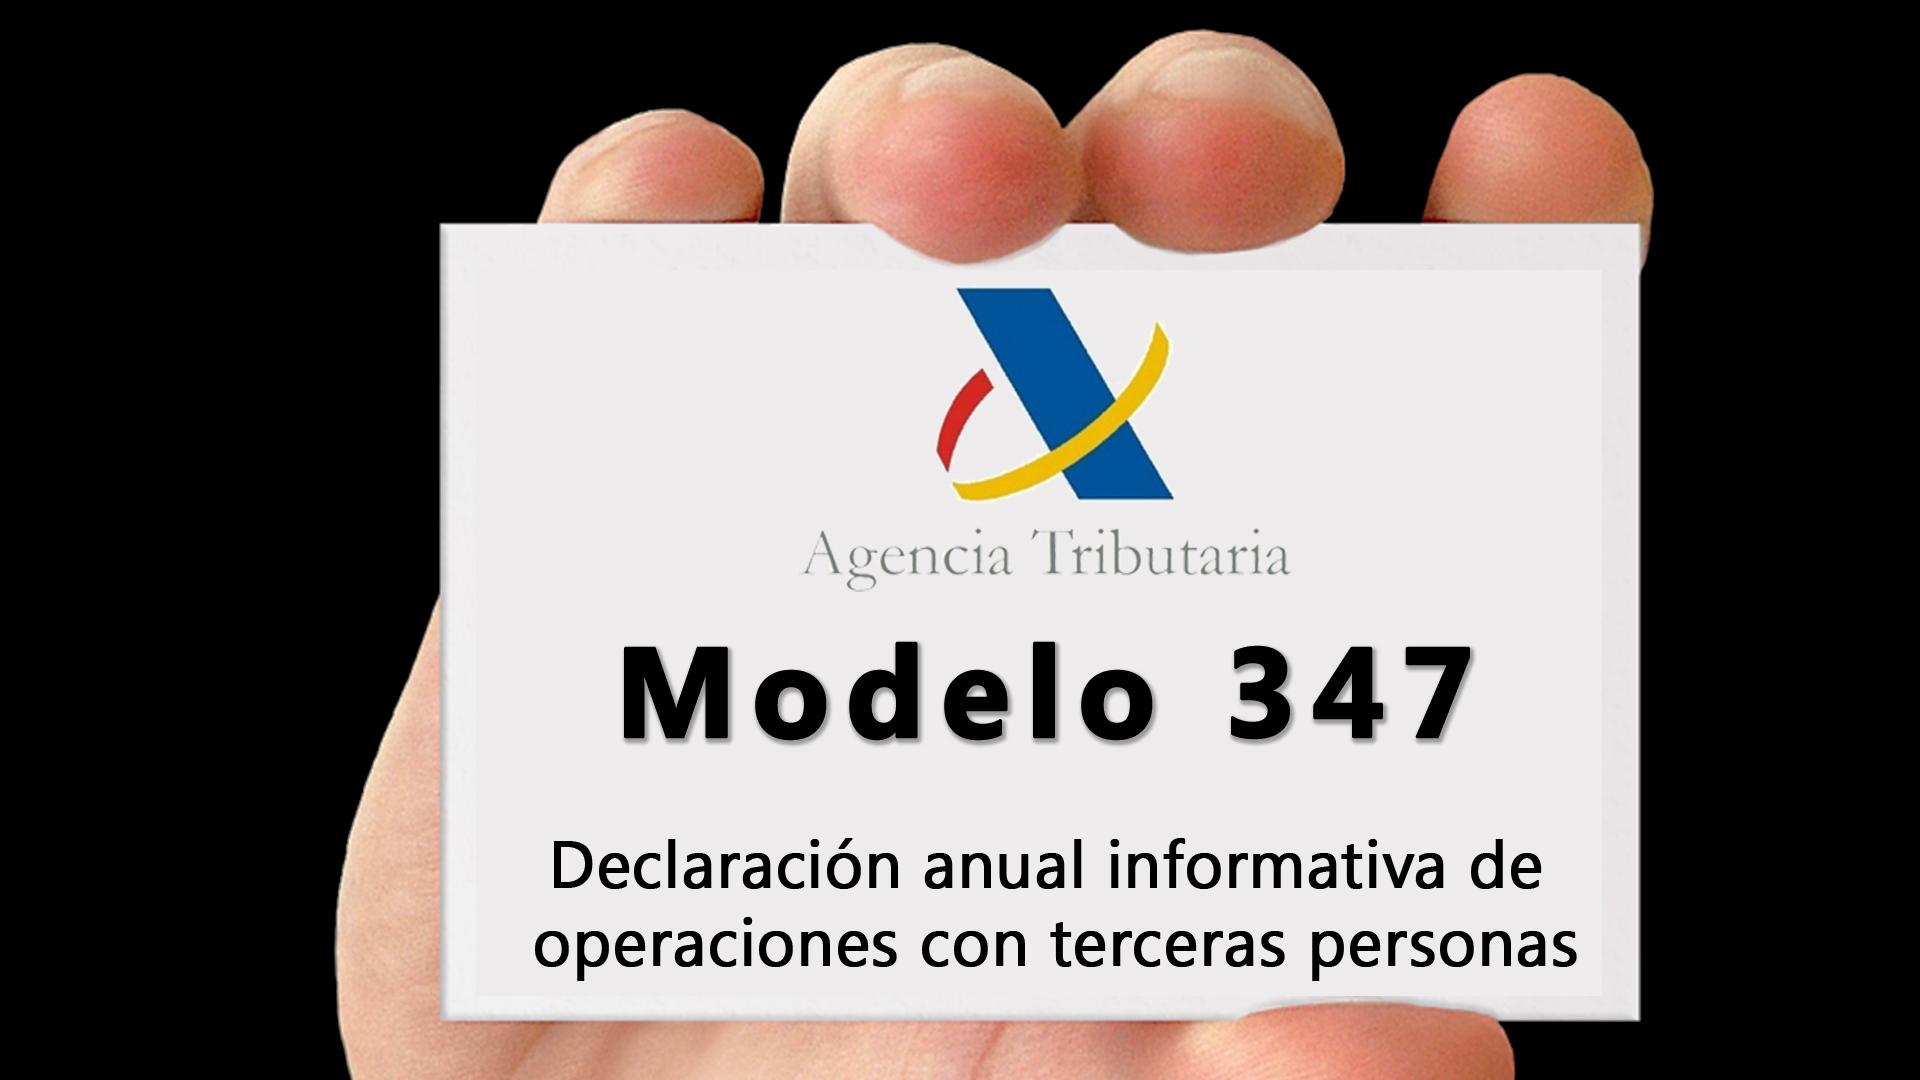 modelo 347 de la agencia tributaria en Dynamics NAV